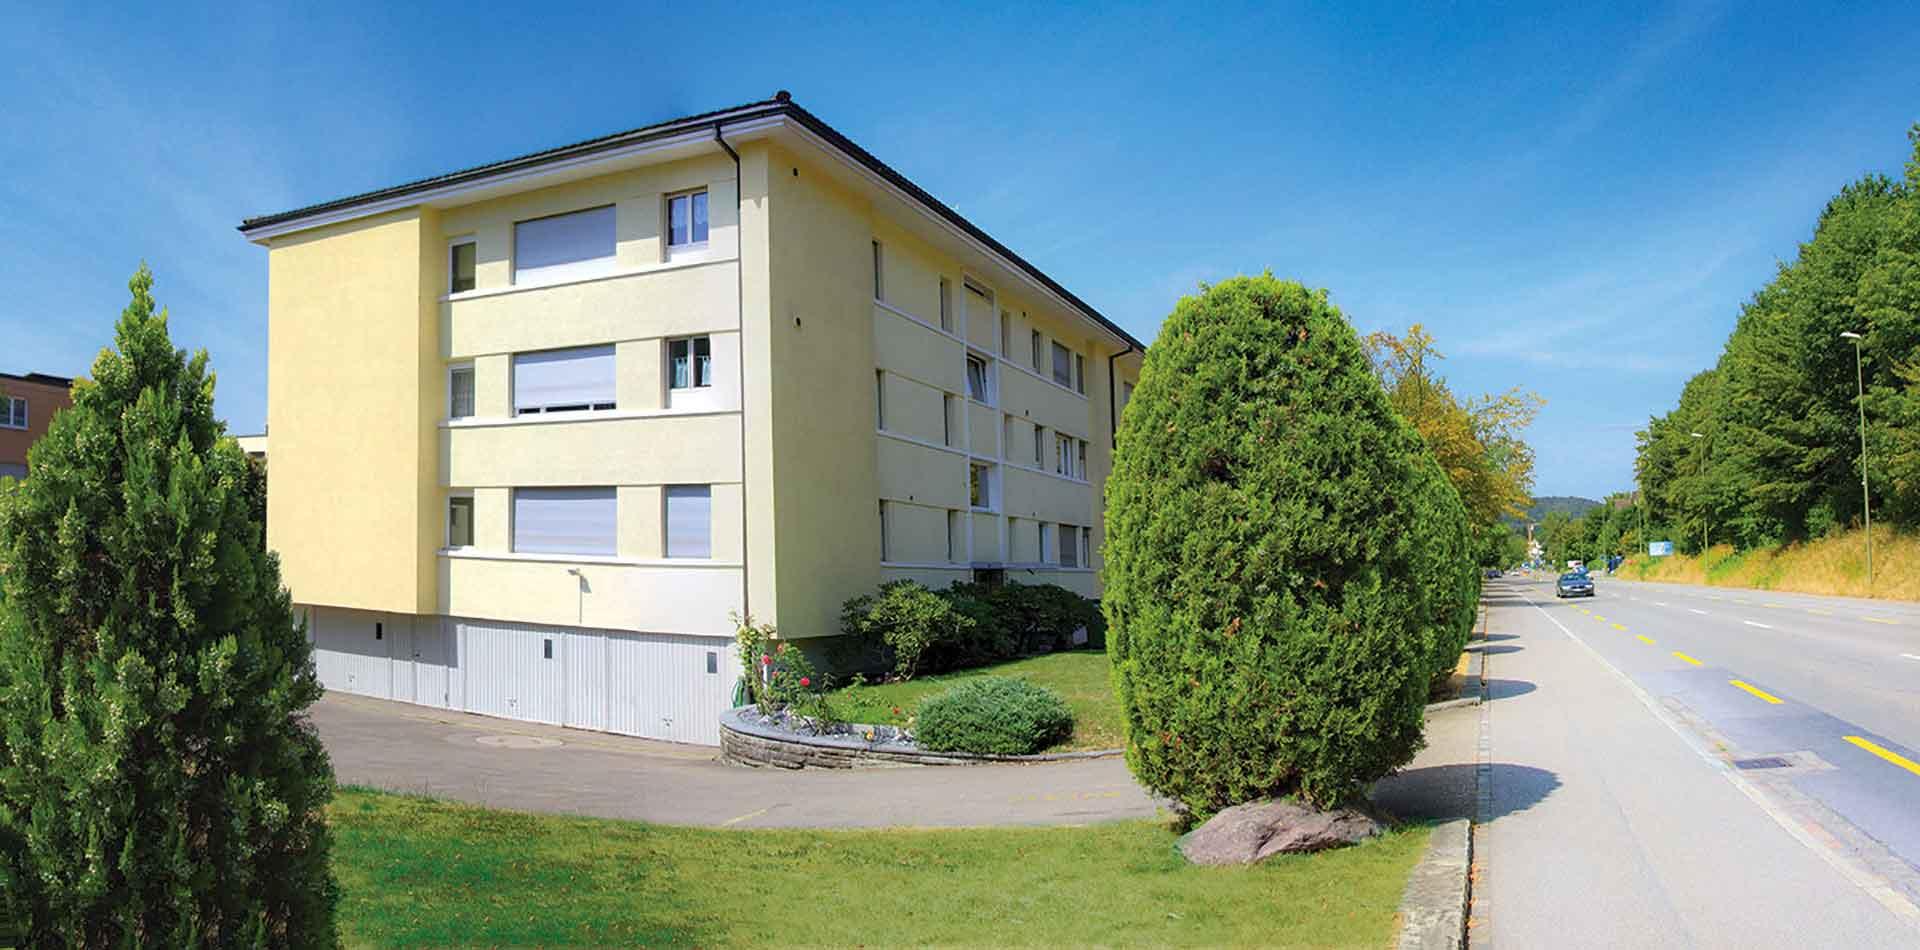 ZÜRCHERSTRASSE 135 | Suisse Promotion